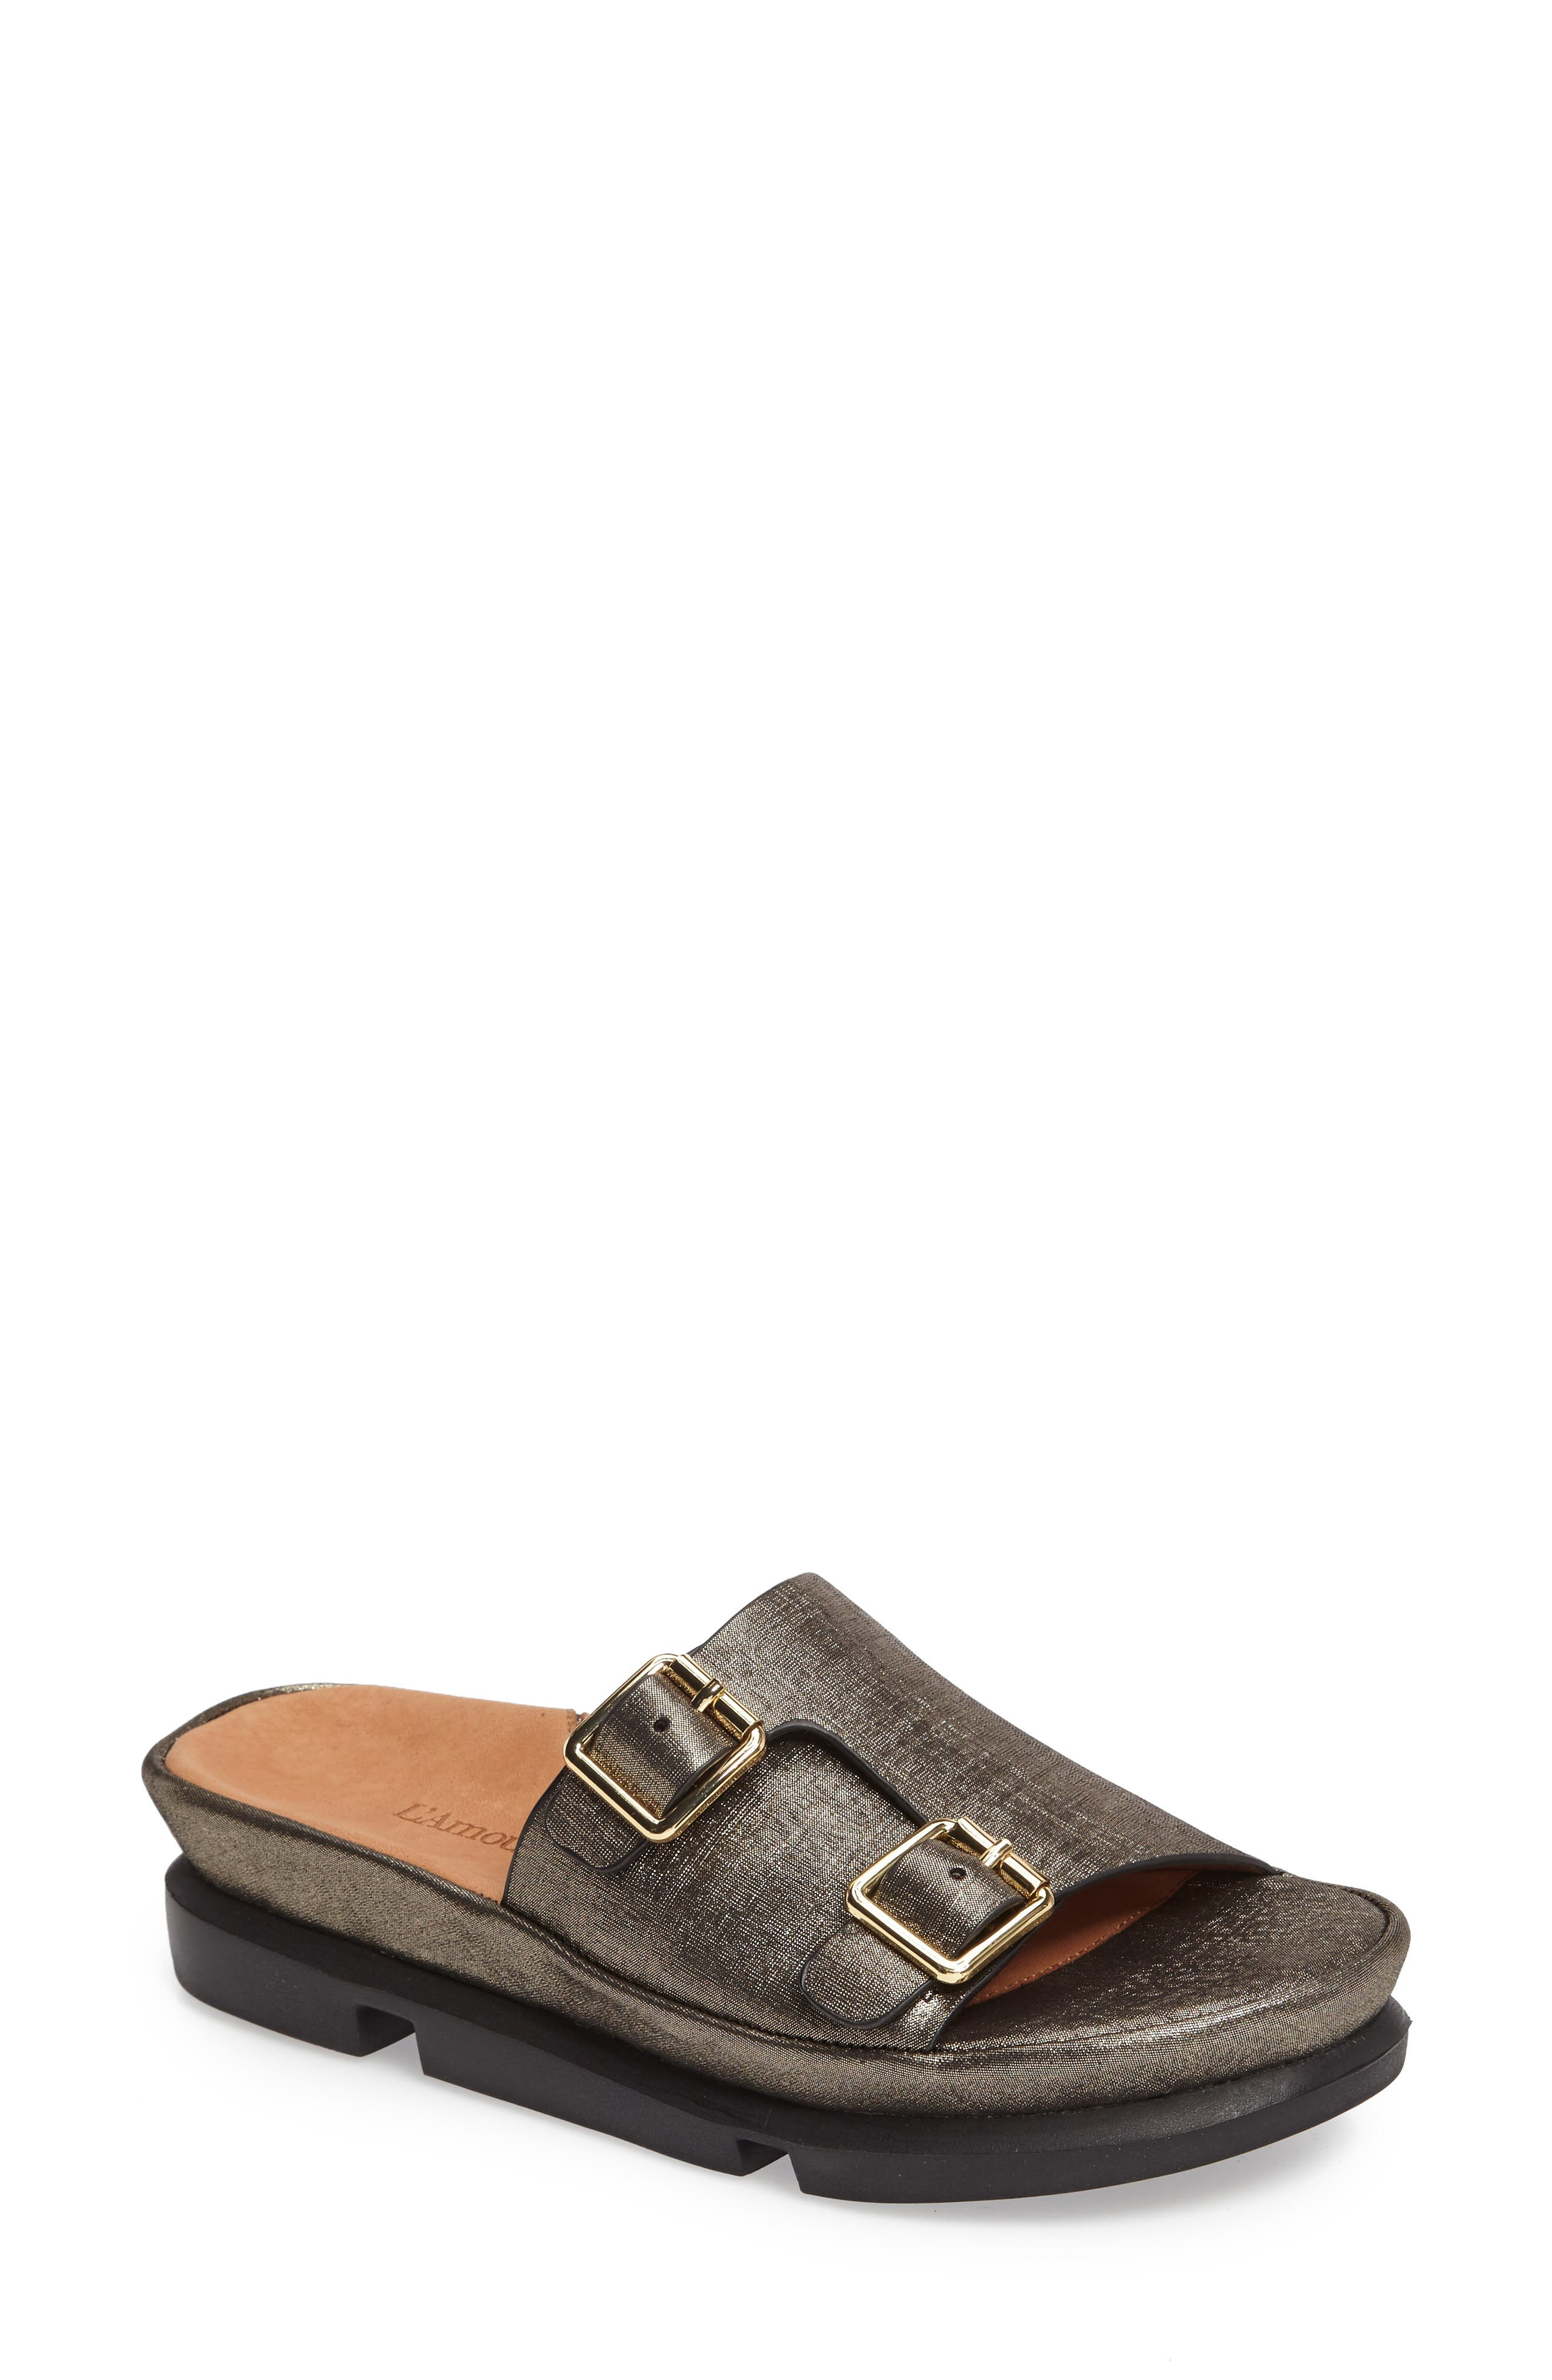 Viareggio Slide Sandal,                         Main,                         color, BLACK ATHENA LEATHER